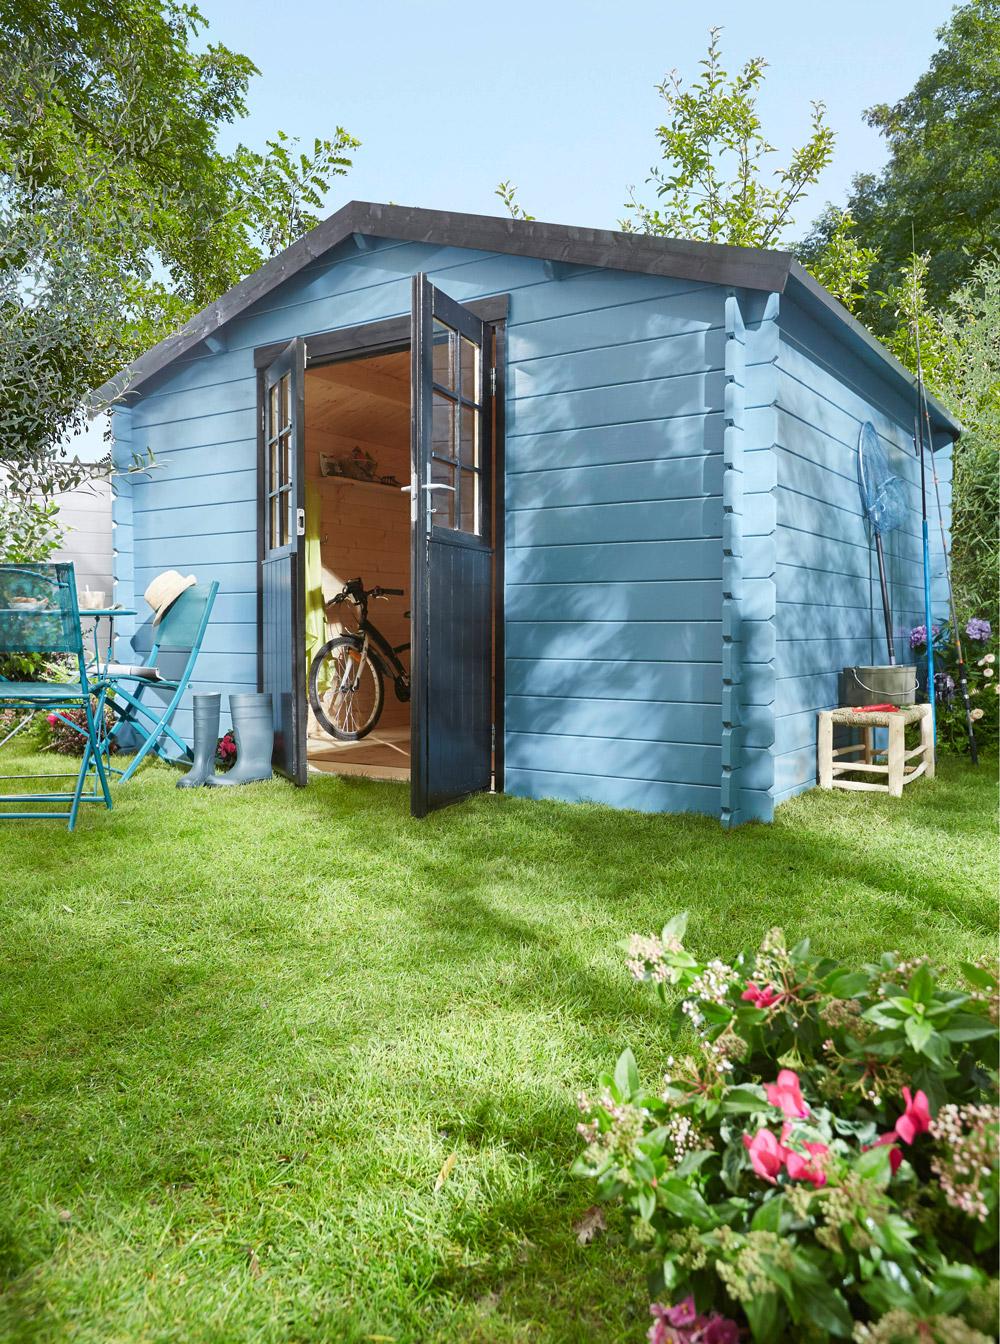 Abri De Jardin Permis De Construire Inspirant Faut Il Une Autorisation Pour Construire Un Abri De Jardin